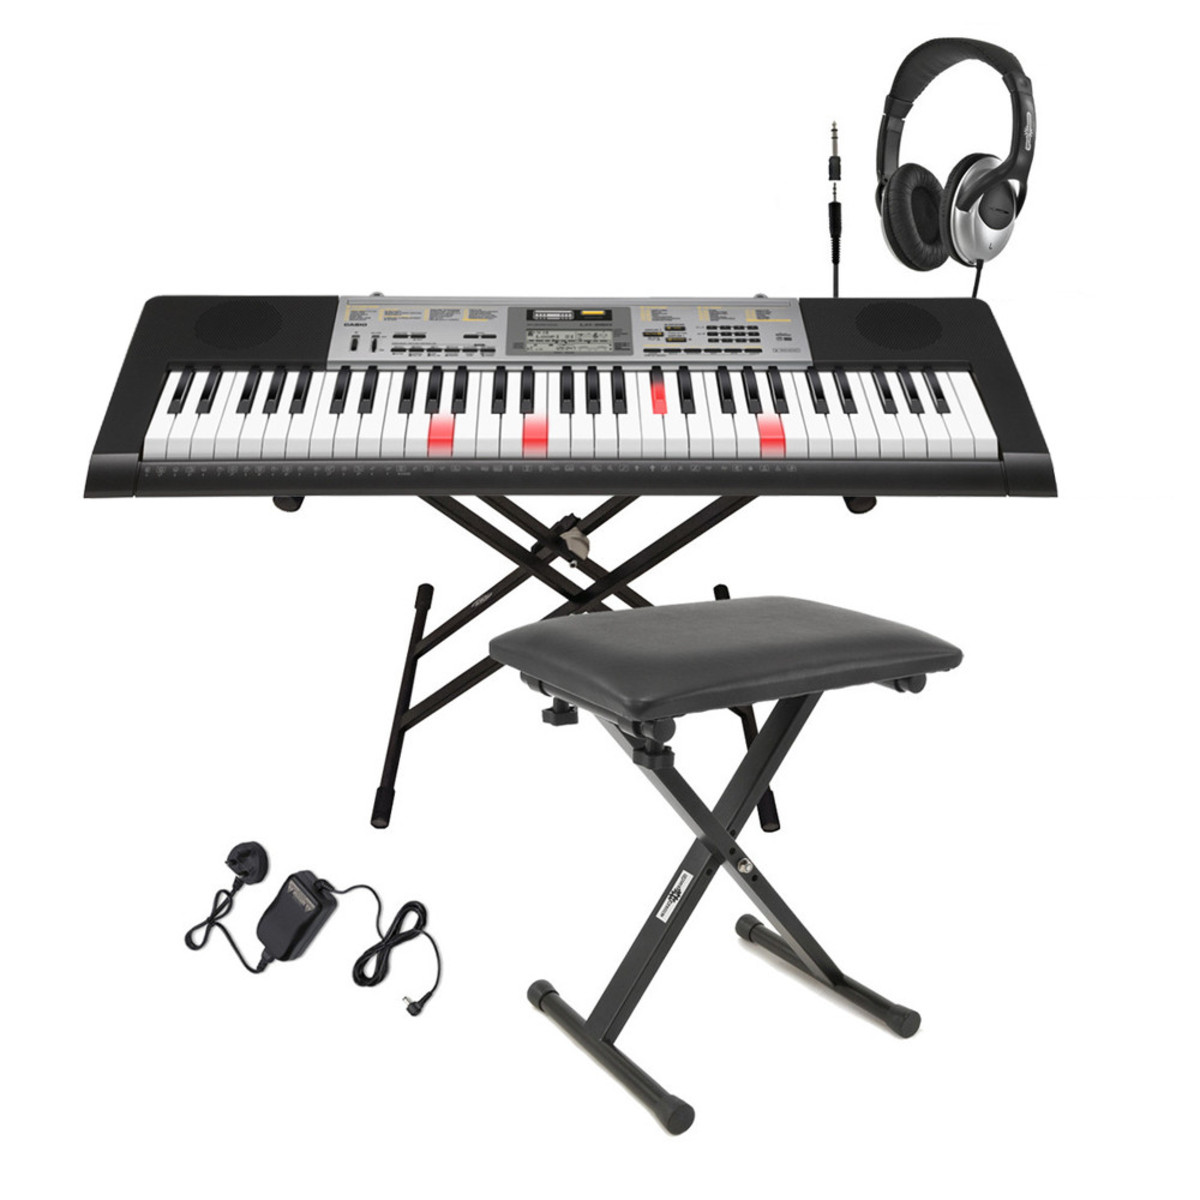 93f1ea78da49 Casio LK-260 Keylighting Keyboard - Complete Pack. Loading zoom